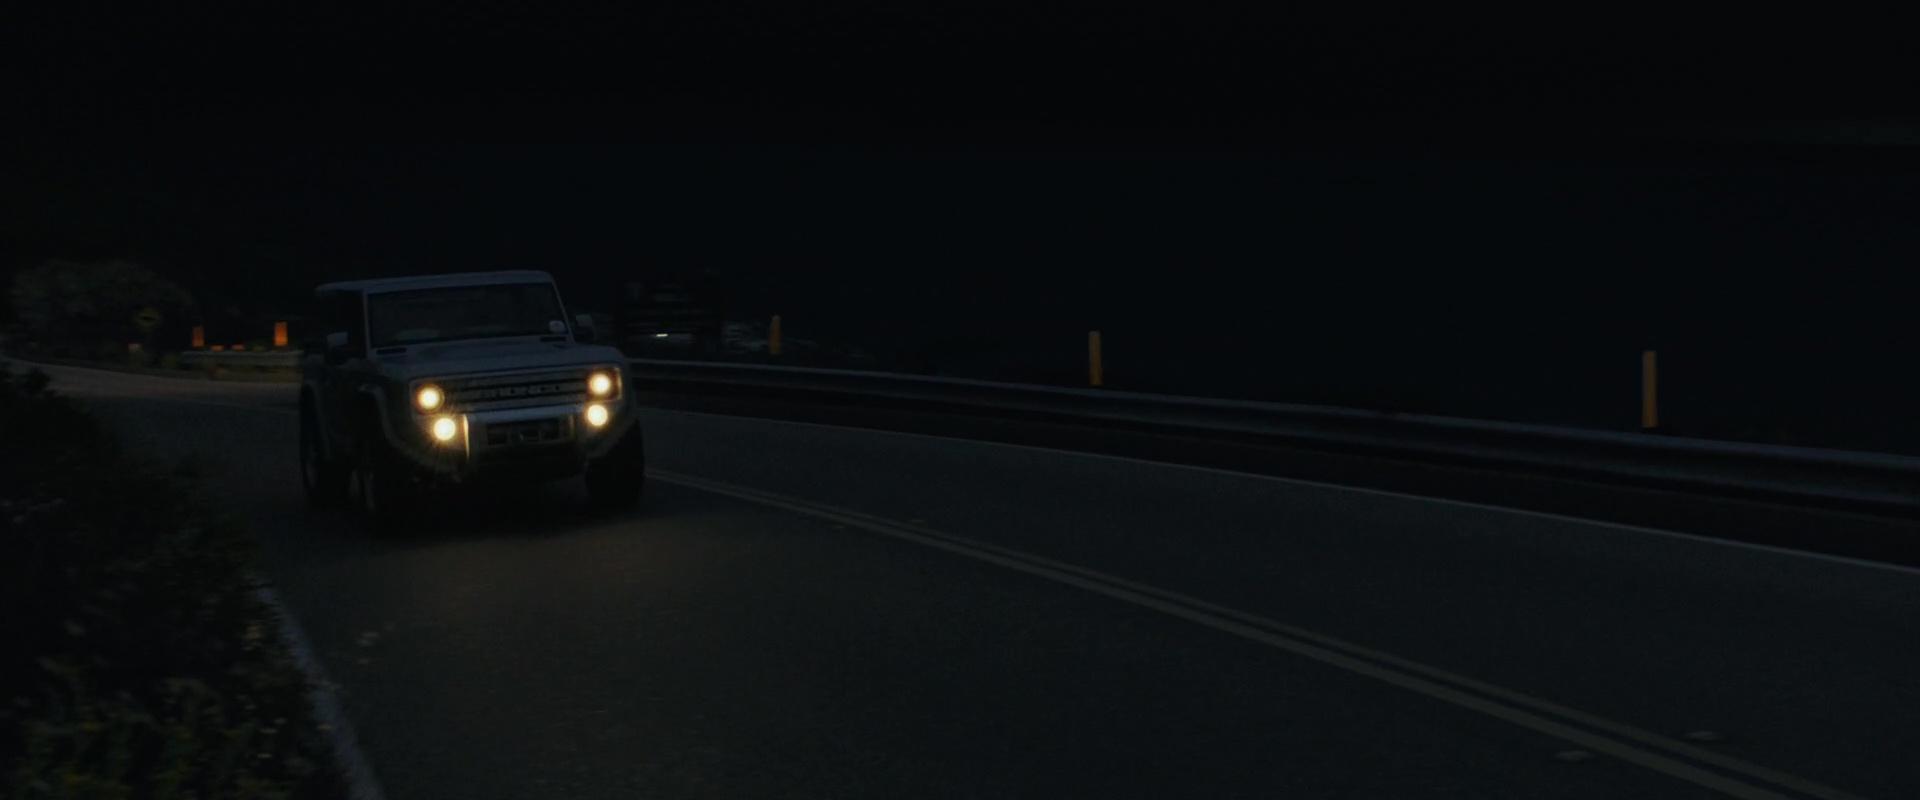 ford bronco car drivendwayne johnson (the rock) in